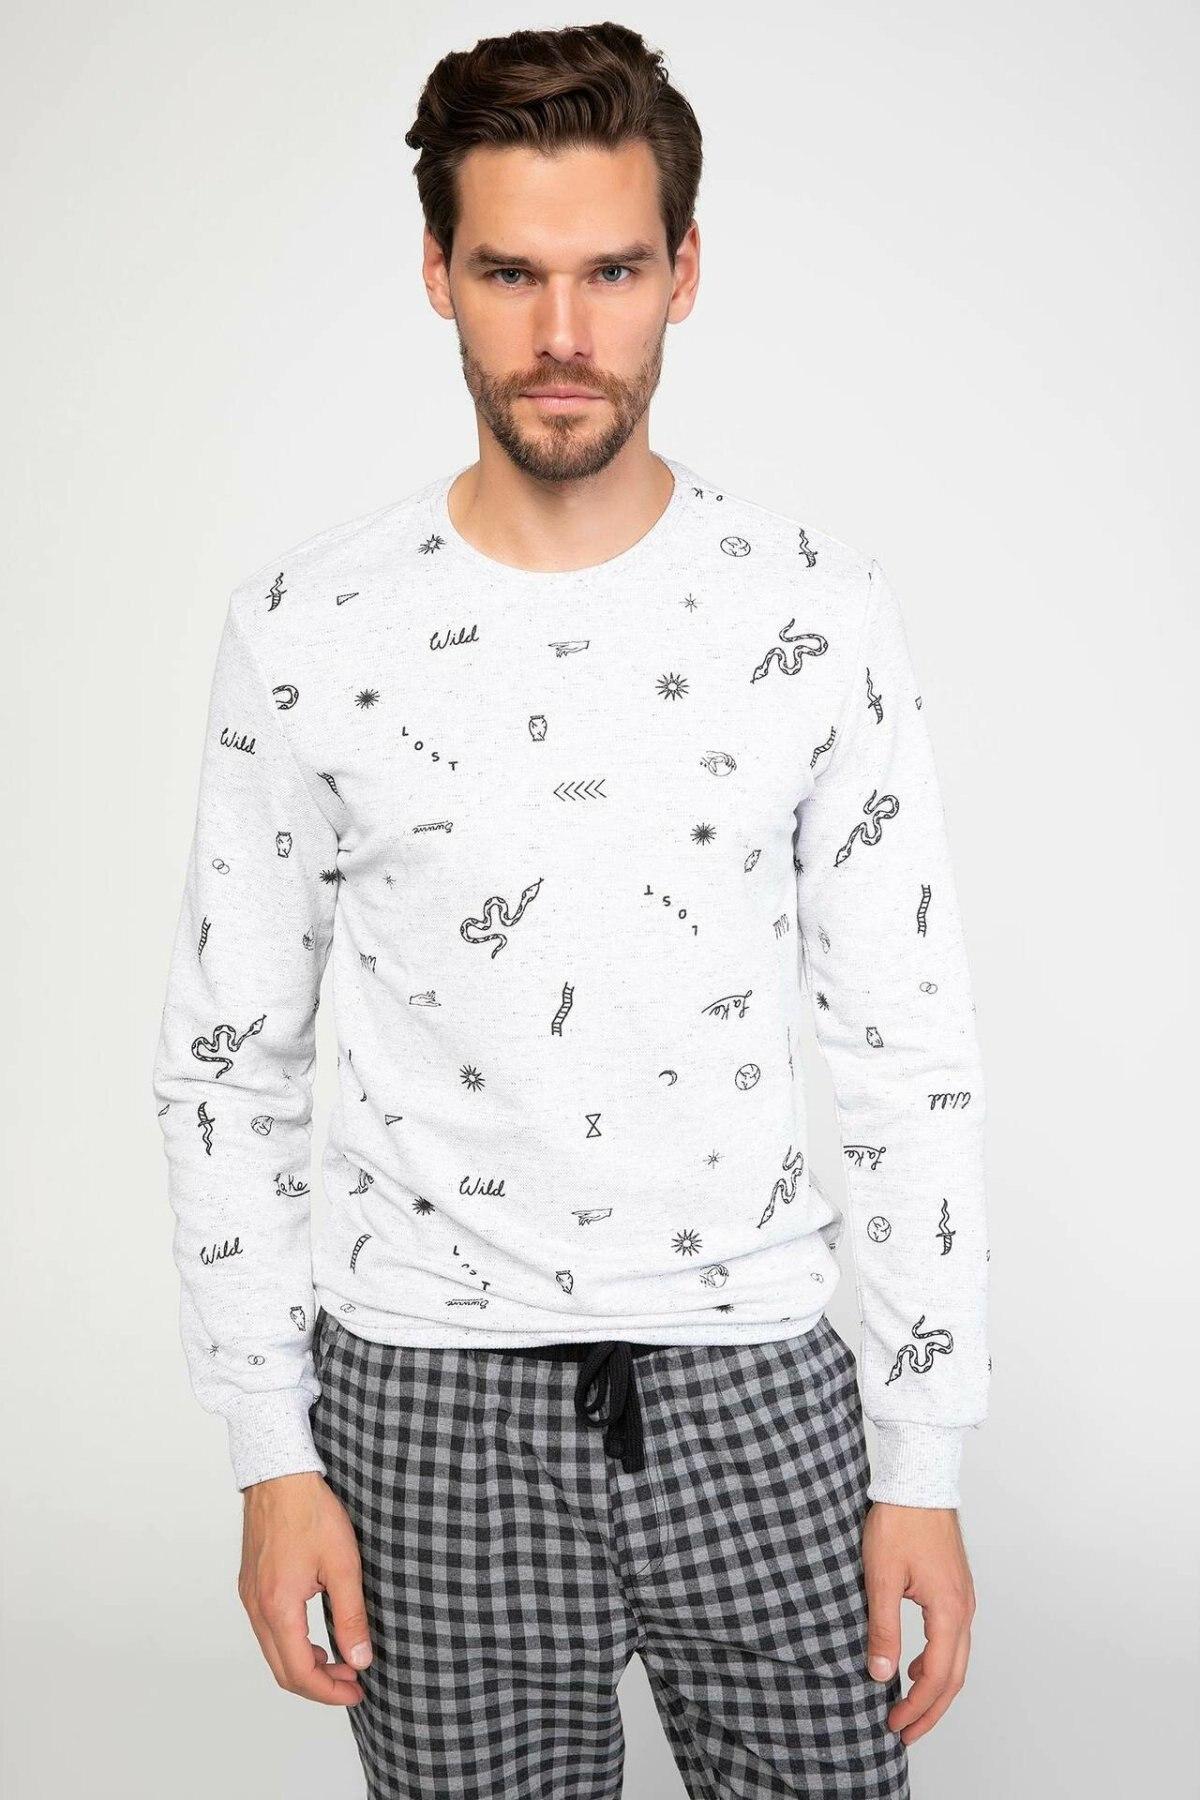 DeFacto Image Prints Men White Homewear Sets Casual Cotton Man Knitted Tops Bottoms Male Pajamas Sets-J8467AZ18WN